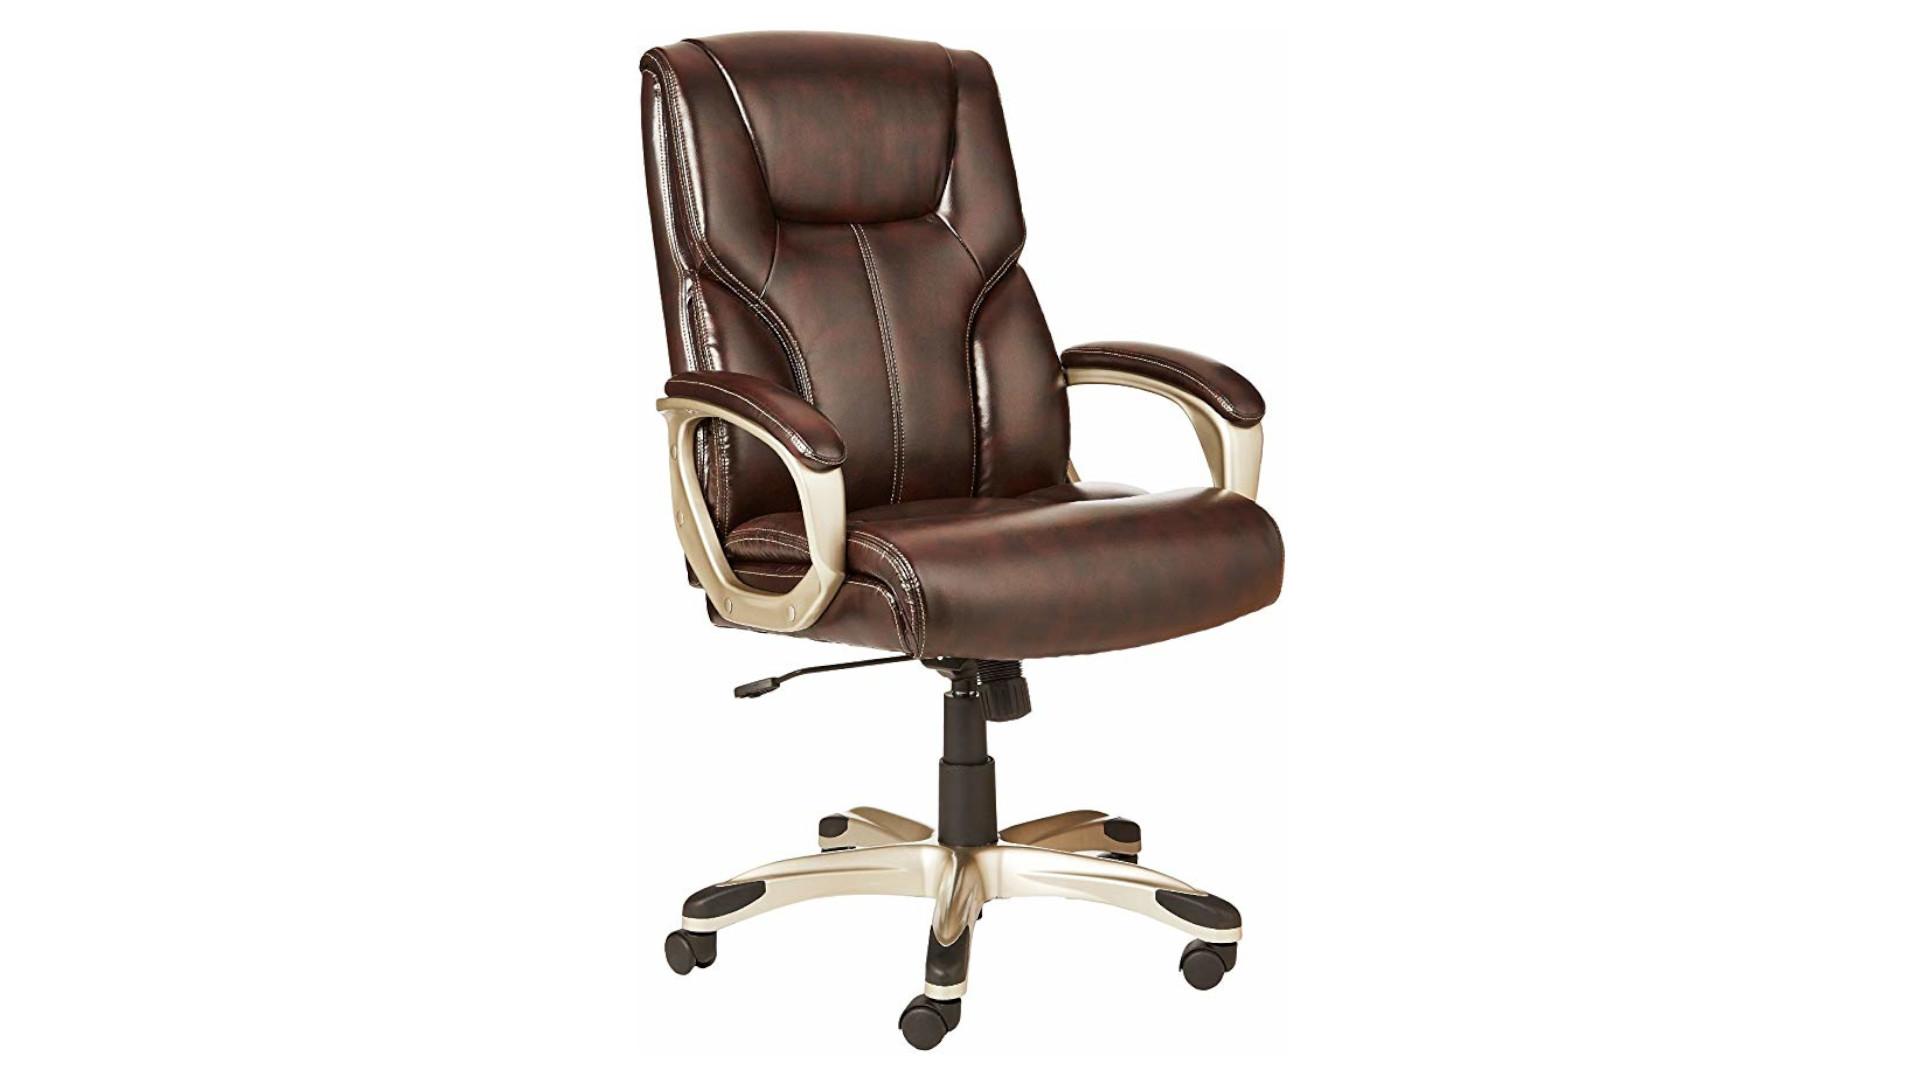 AmazonBasics Executive Desk Chair